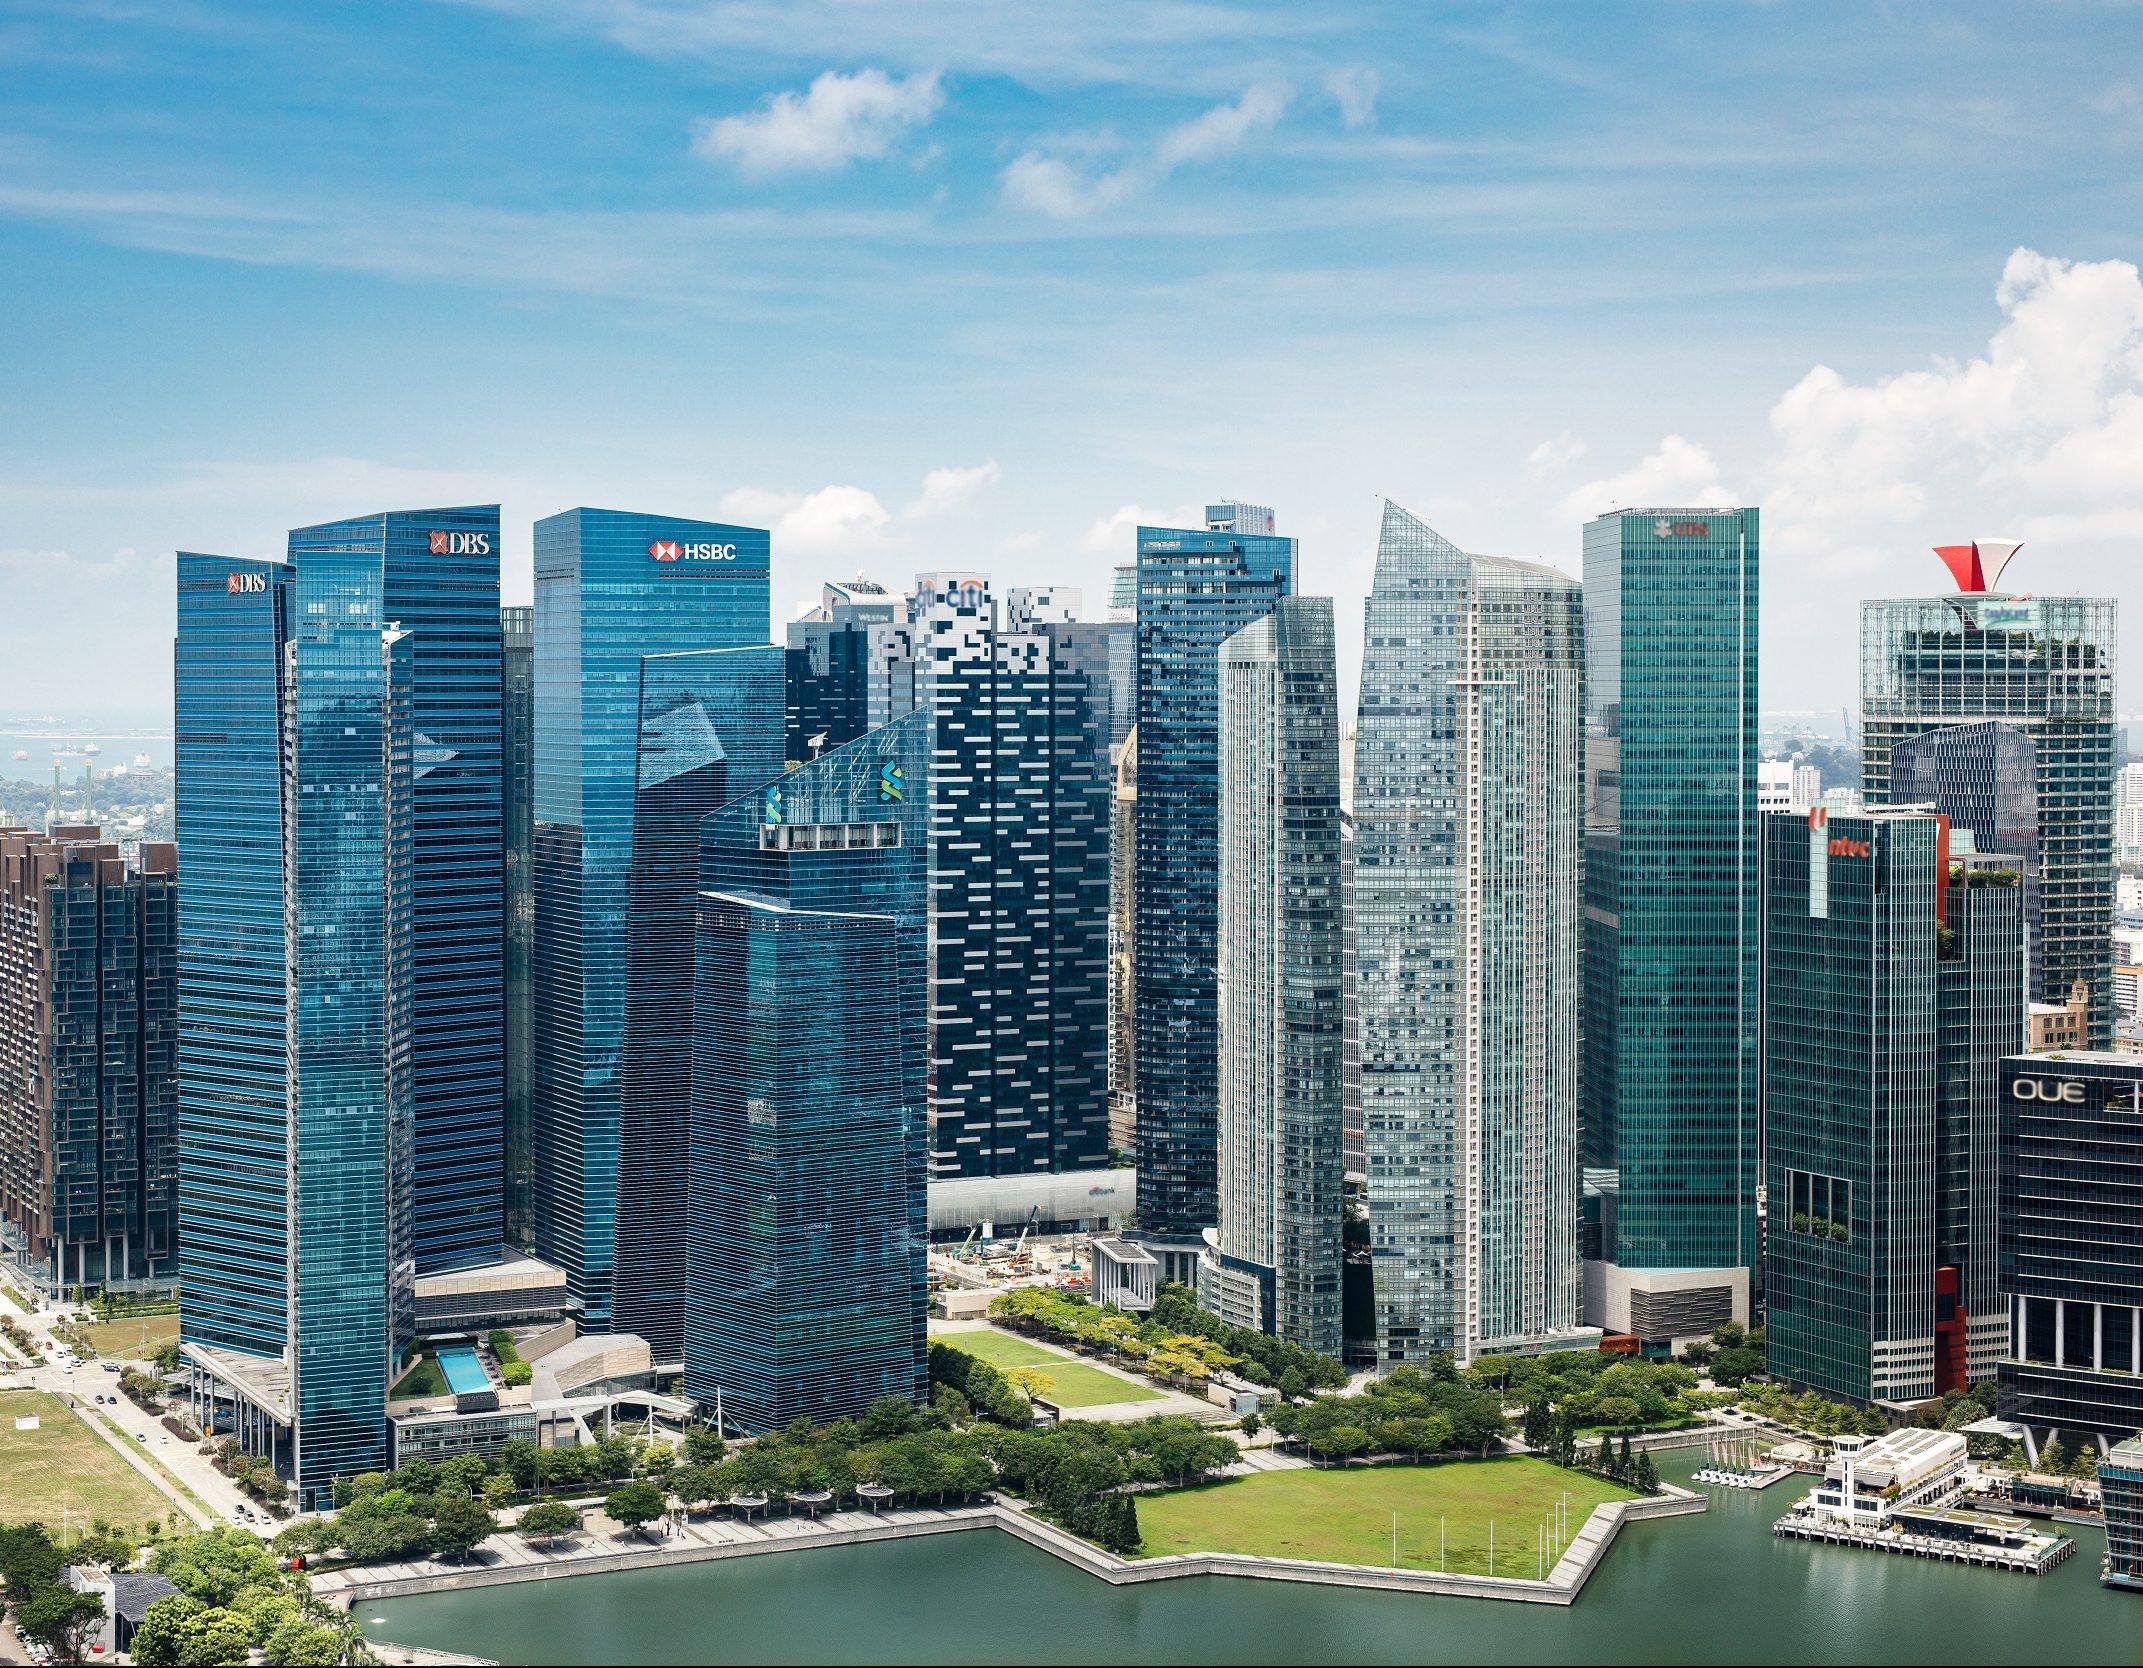 DBS, Marine Bay, Singapore